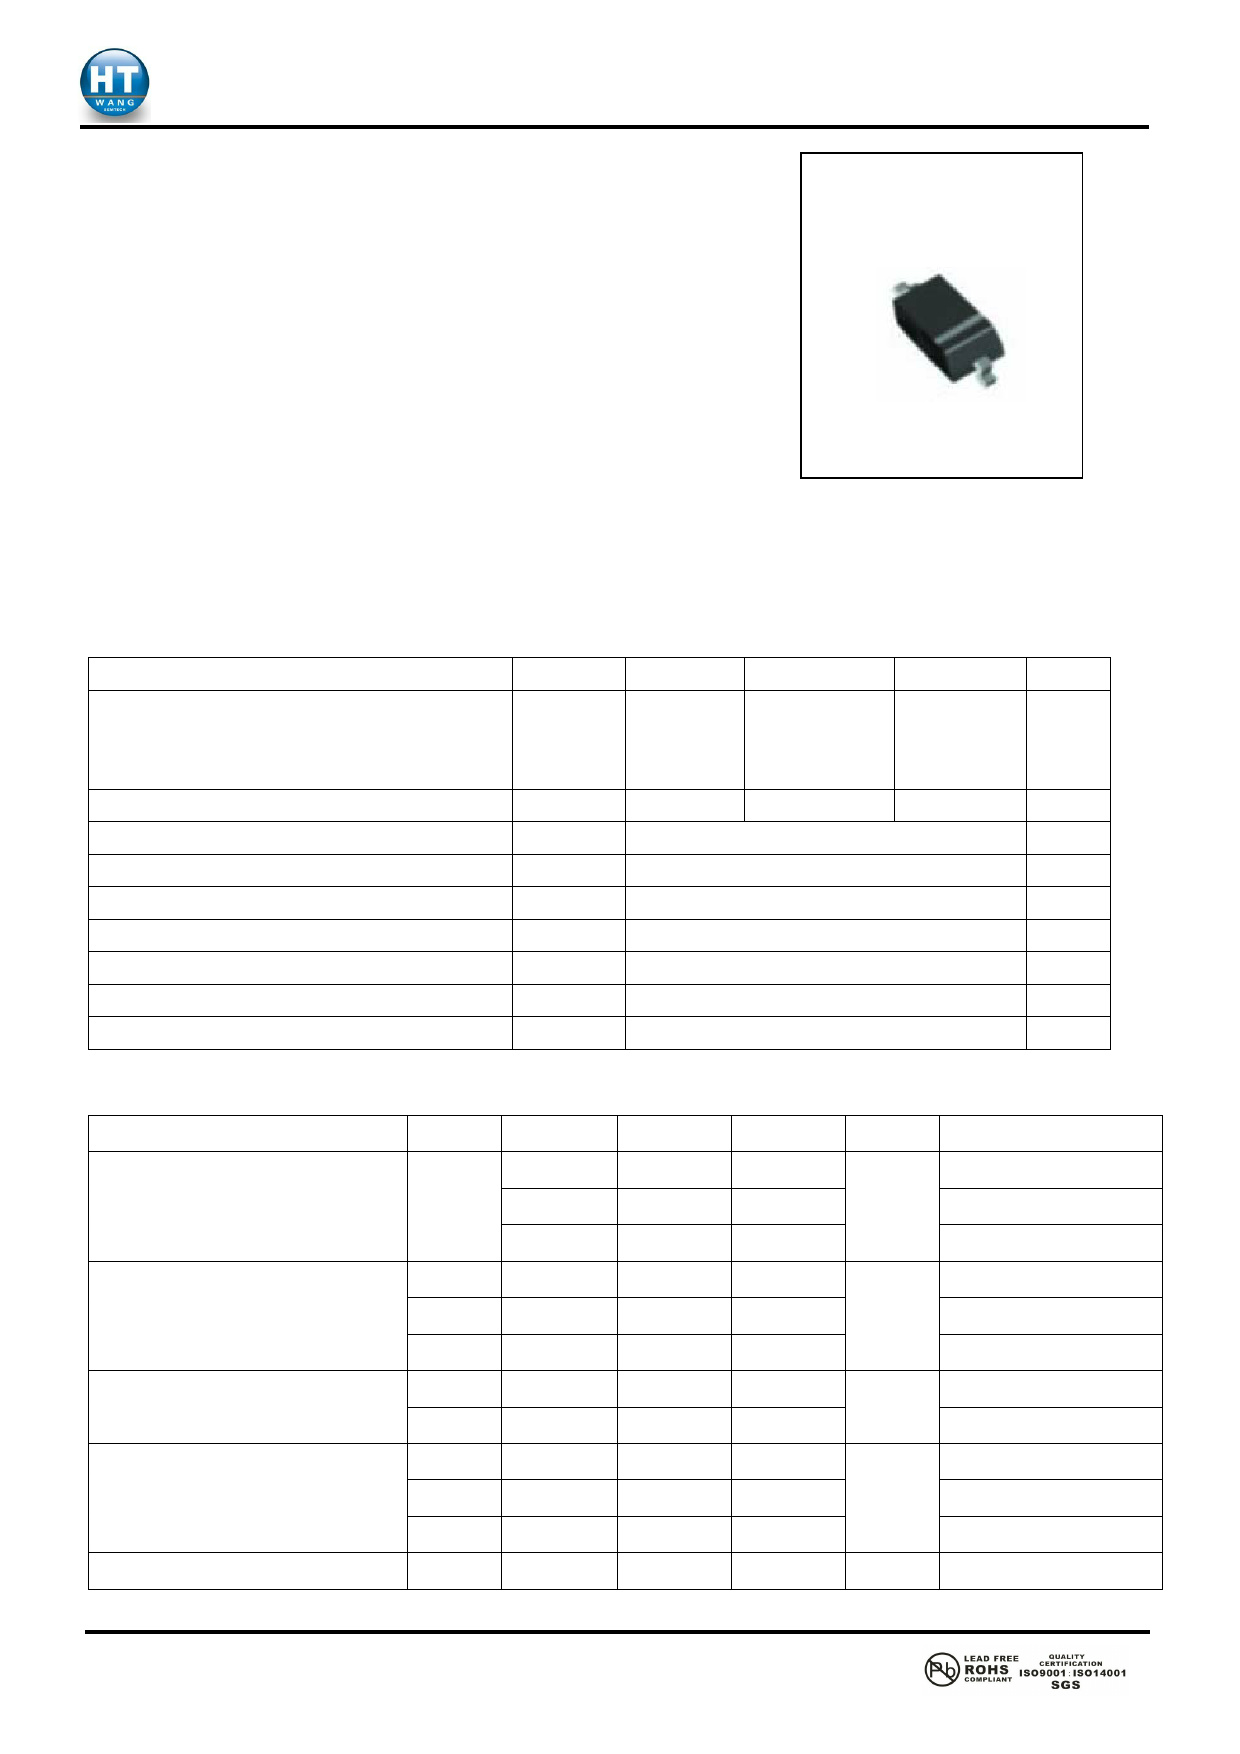 B0520WS datasheet